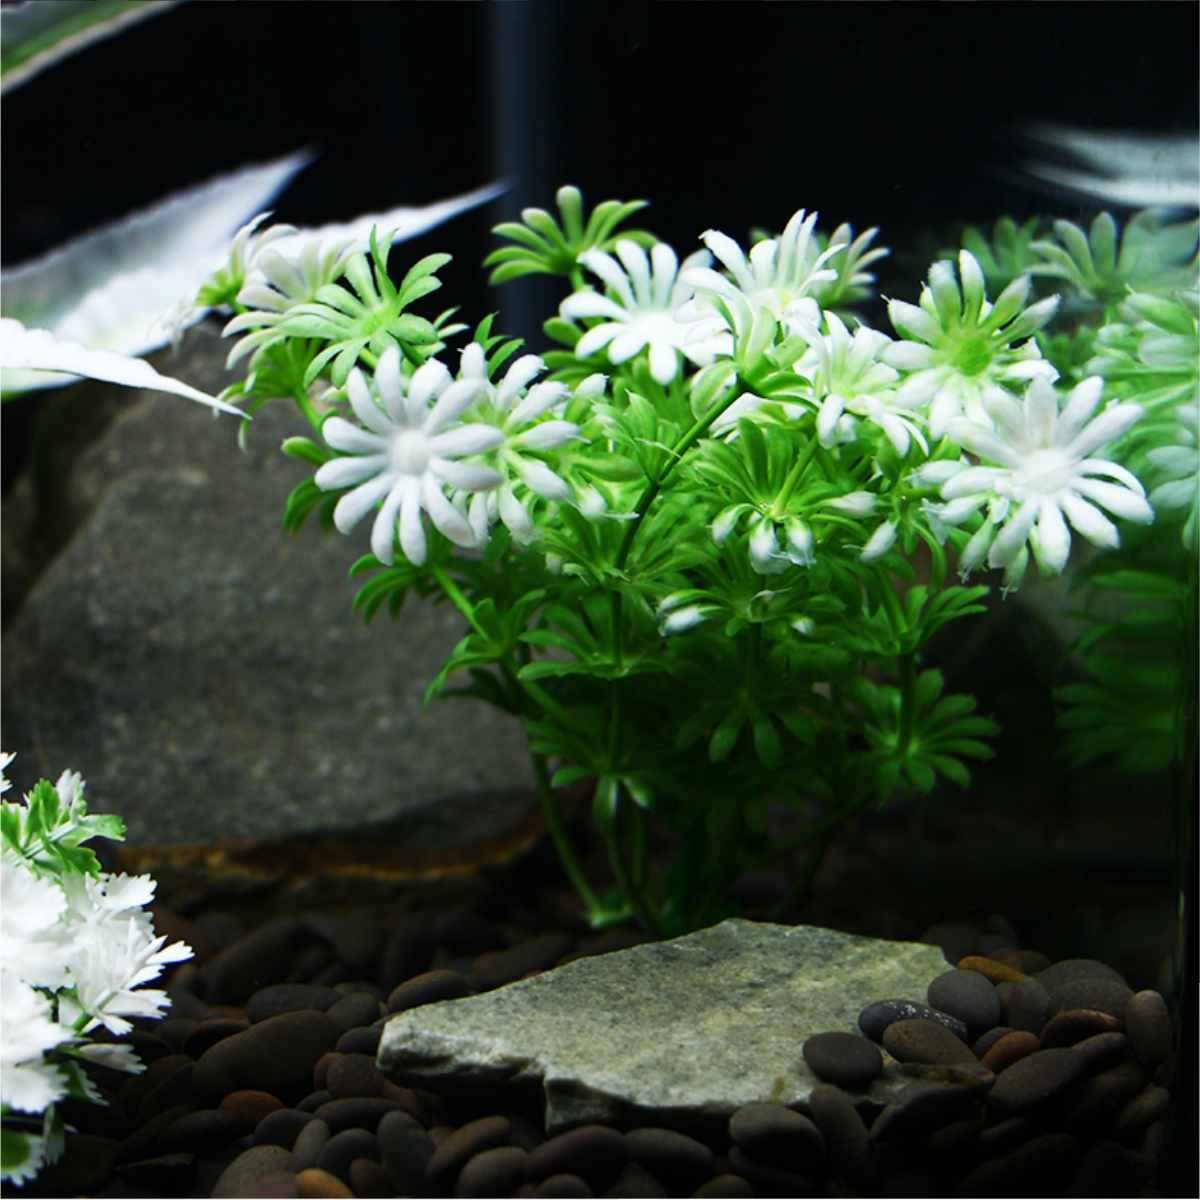 Plastic Artificial Underwater Plants Aquarium Fish Tank Decoration Green Water Grass White Leaf Crown Grass Viewing Decorations